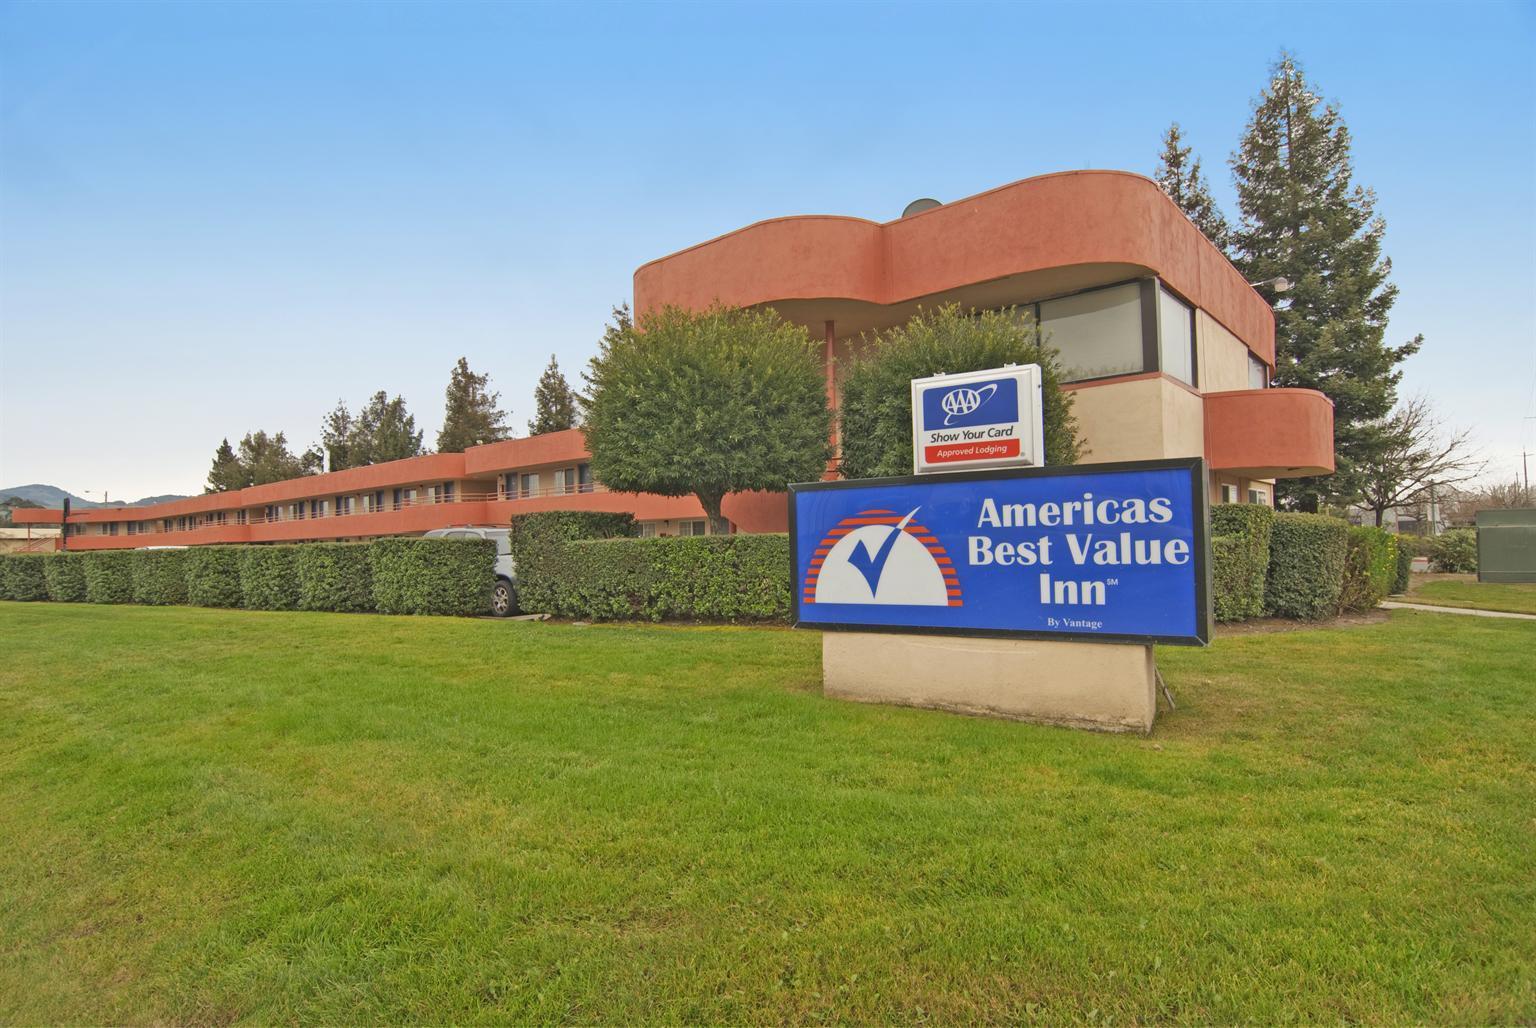 Americas Best Value Inn Santa Rosa At 1800 Santa Rosa Avenue Santa Rosa Ca On Fave